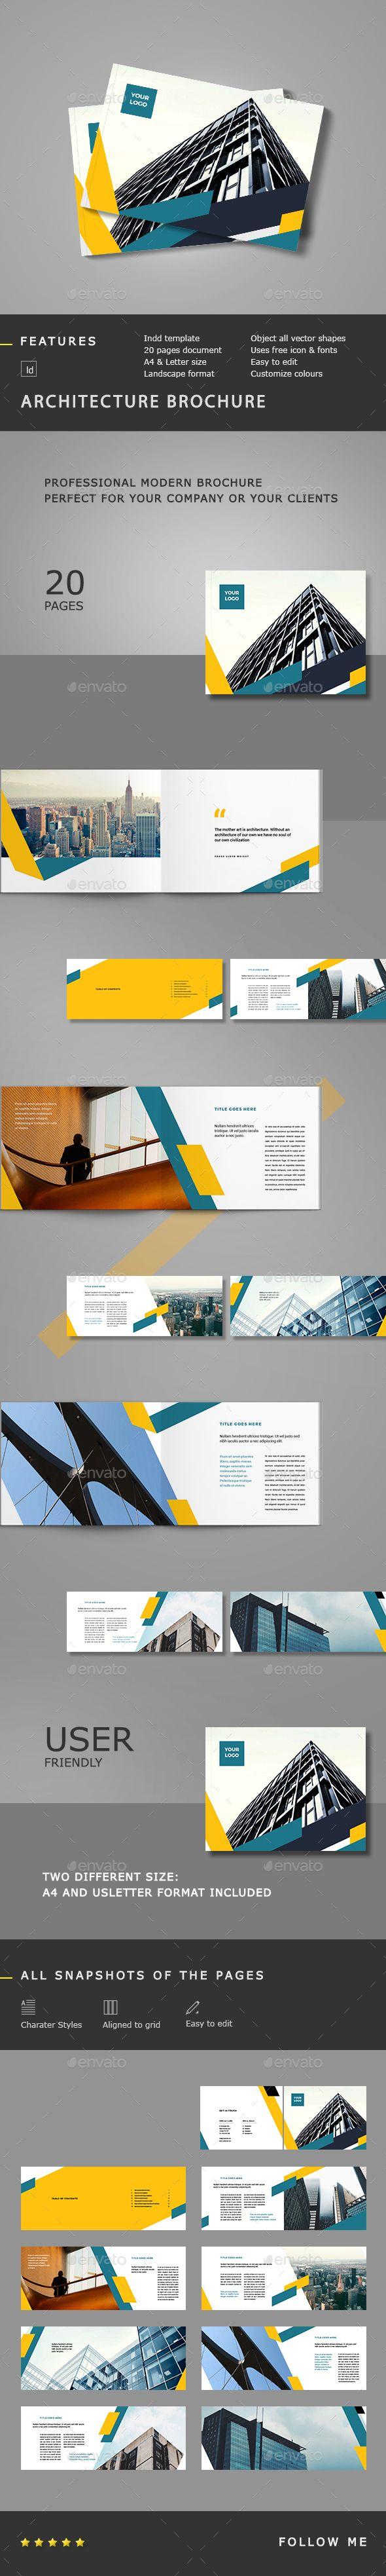 Architecture Landscape Brochure Template InDesign INDD #design Download: http://graphicriver.net/item/architecture-landscape-brochure/14209765?ref=ksioks